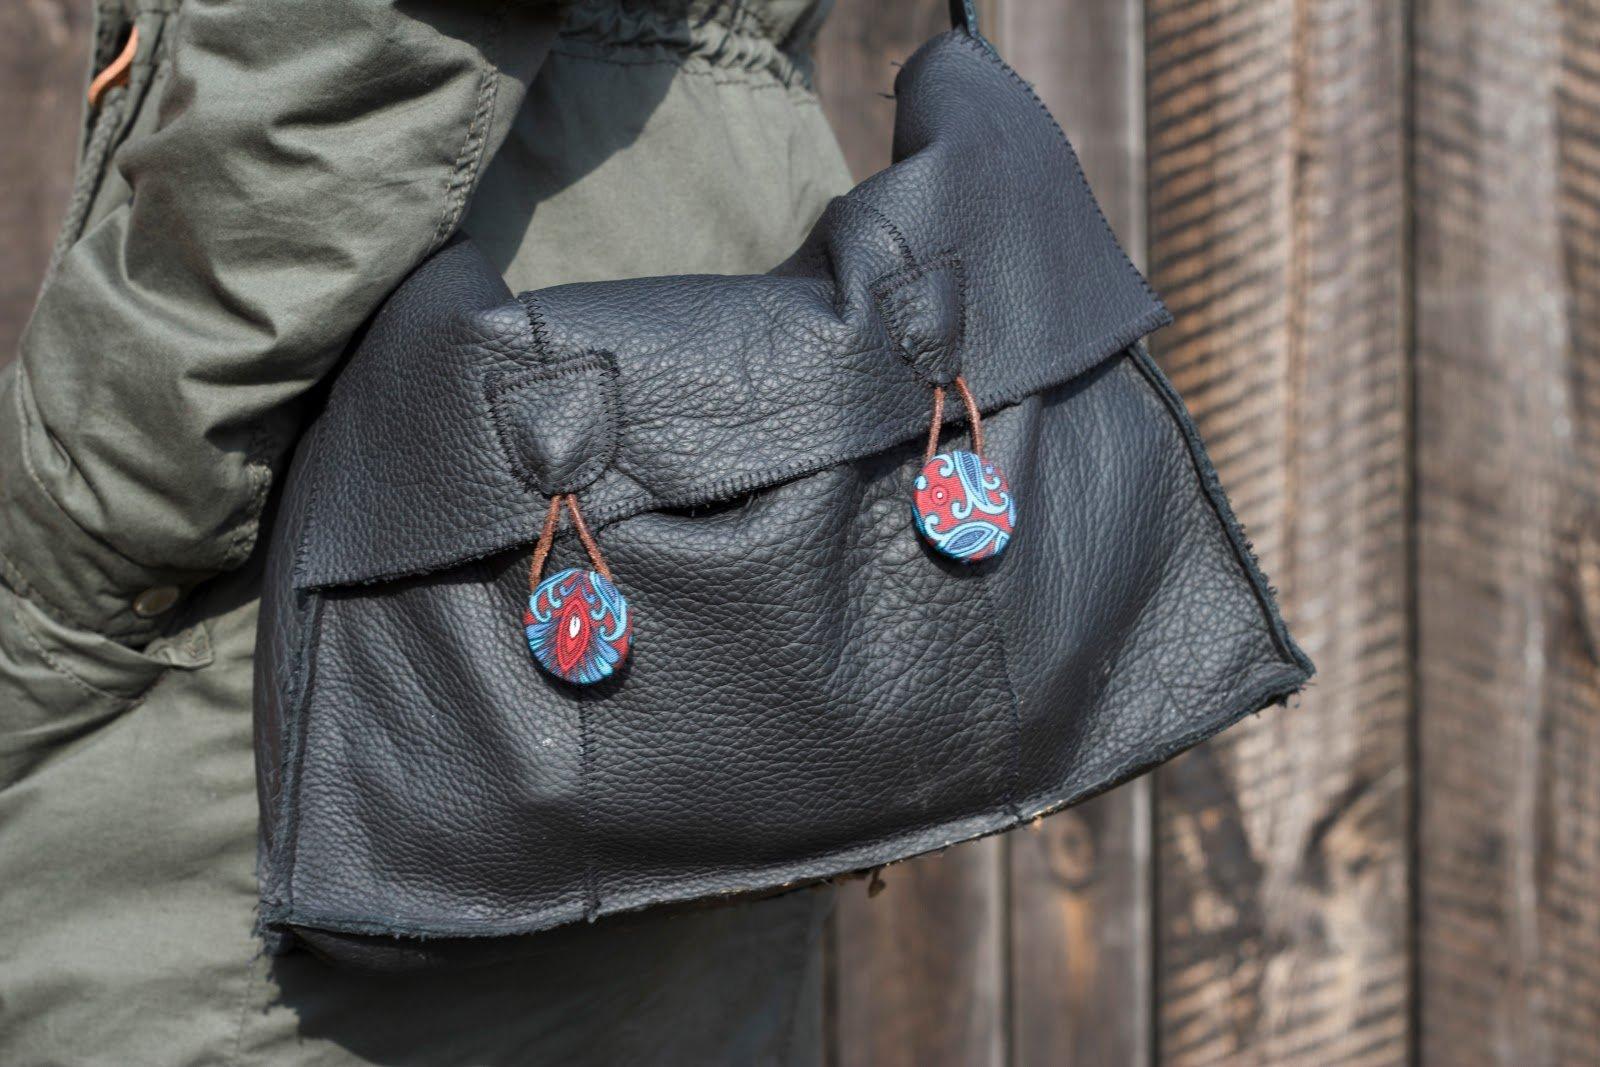 [DIY] Tasche aus Lederresten selber nähen - HANDMADE Kultur